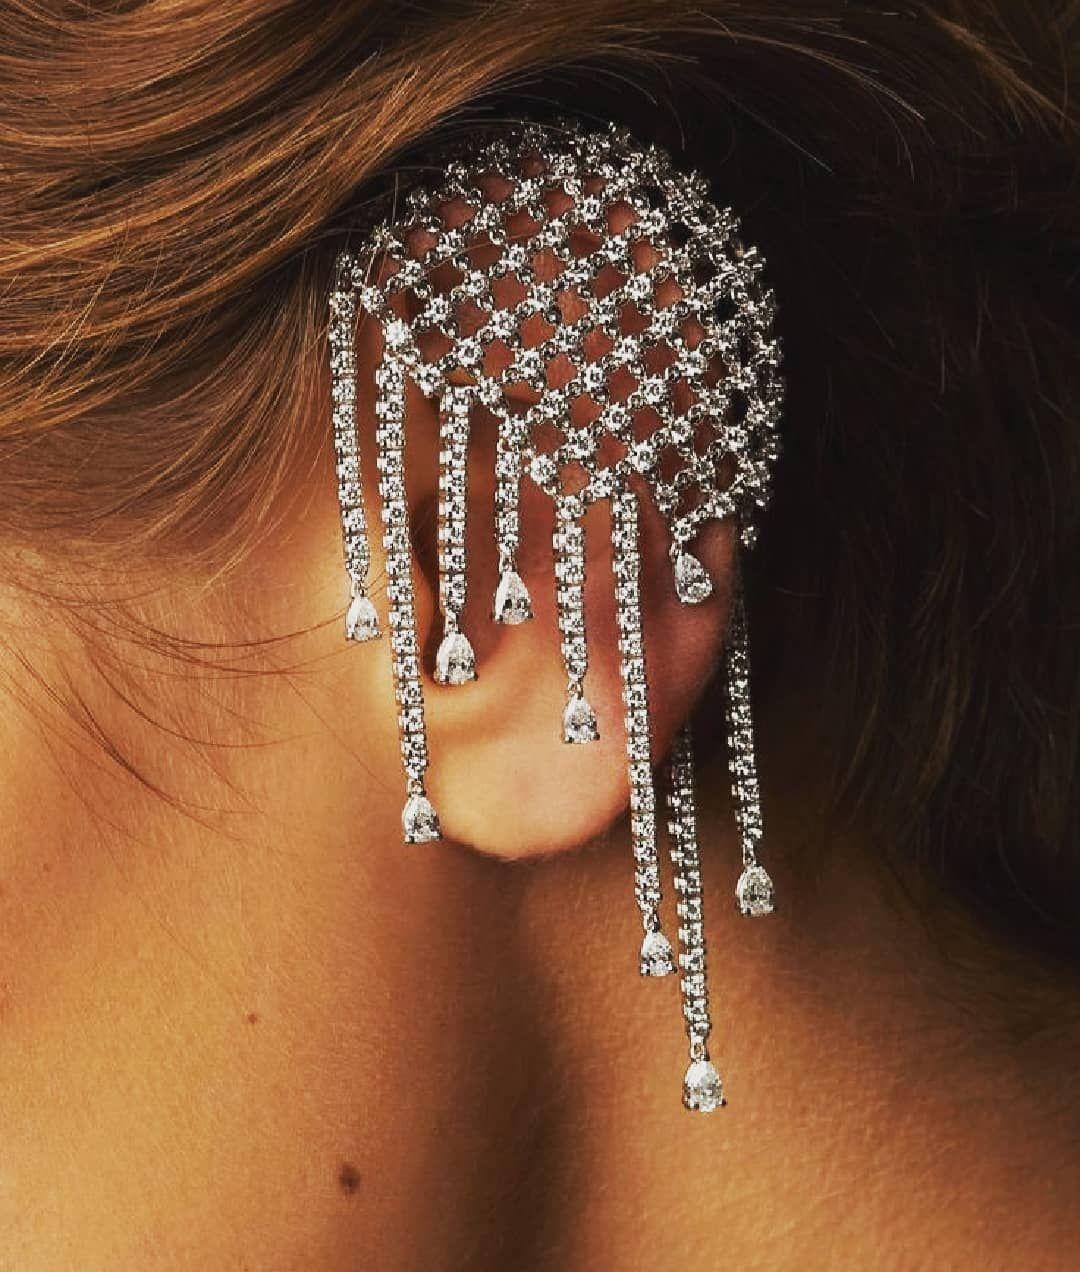 JUBAOLI A1090 Female Ring Bracelet Hollow-out Lace Quartz Watch in 2020 |  Pinterest jewelry, Ear jewelry, Rose gold jewelry